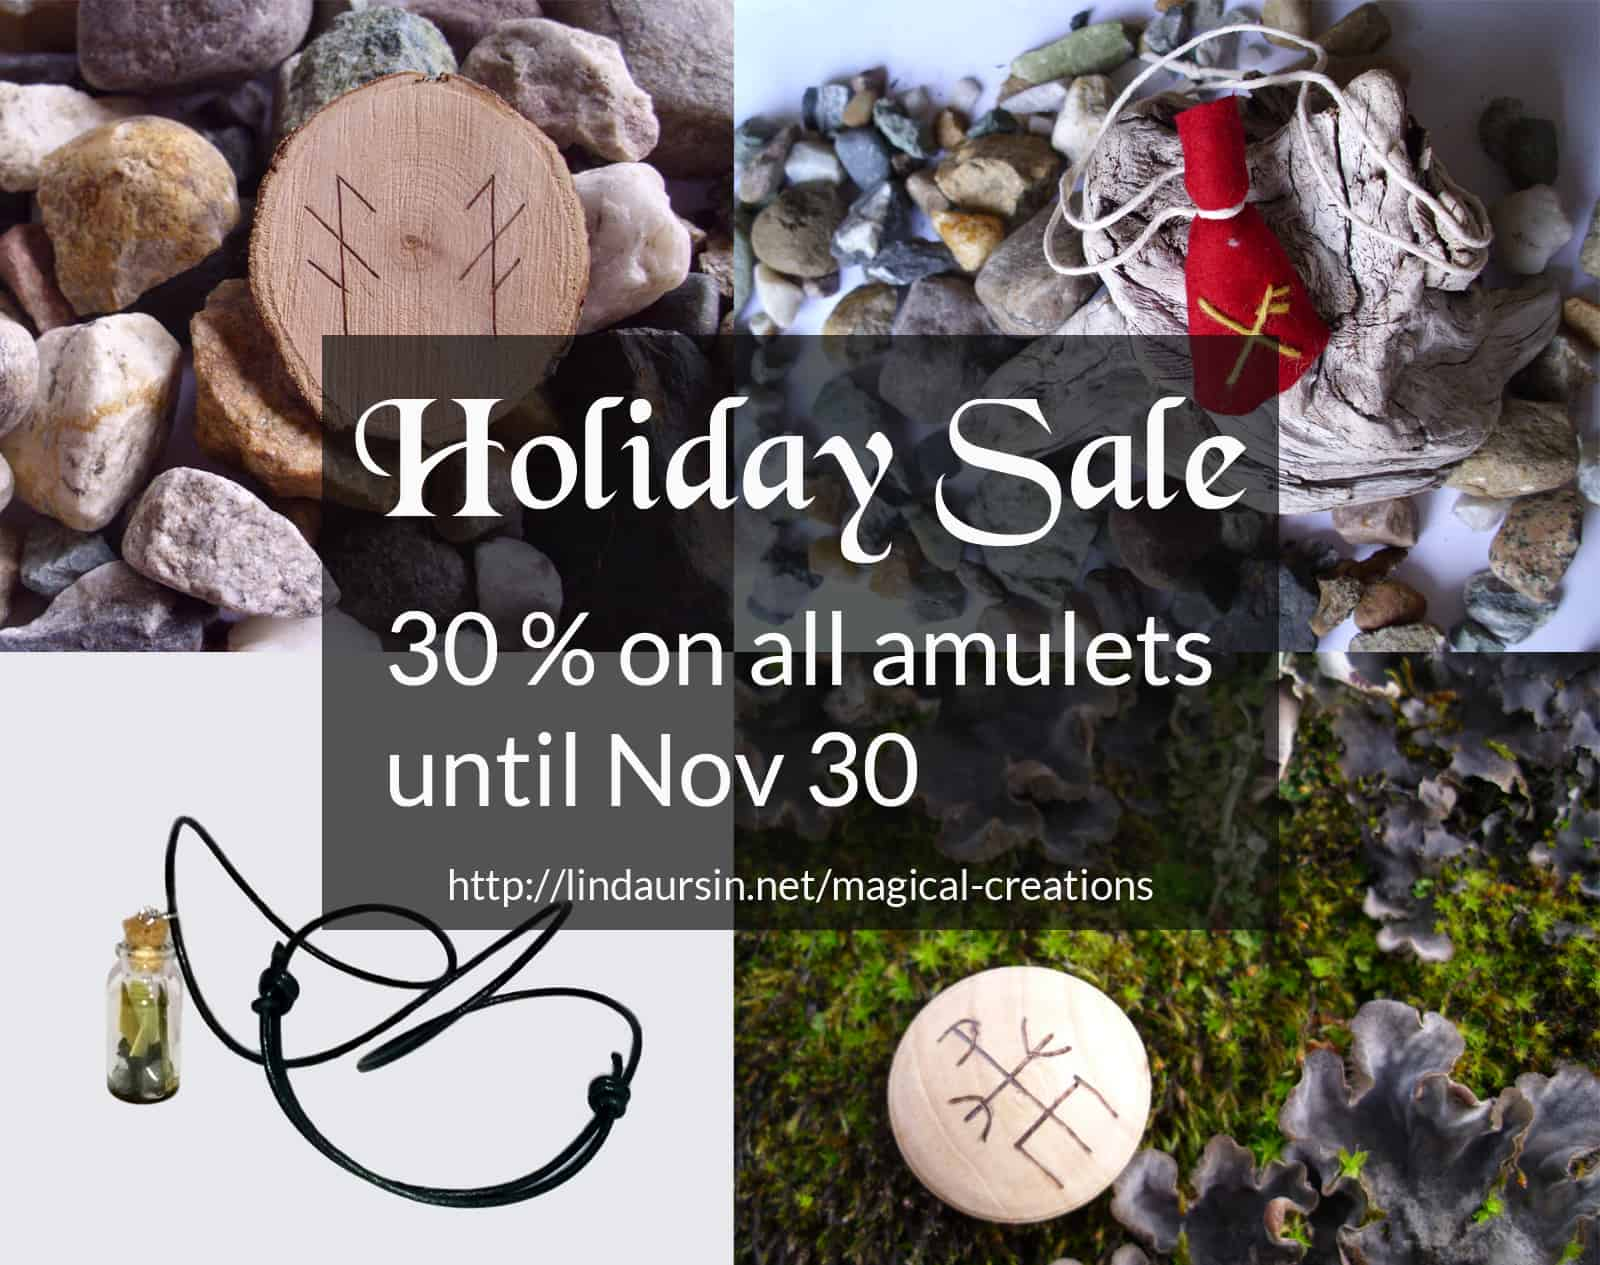 amulets holiday sale